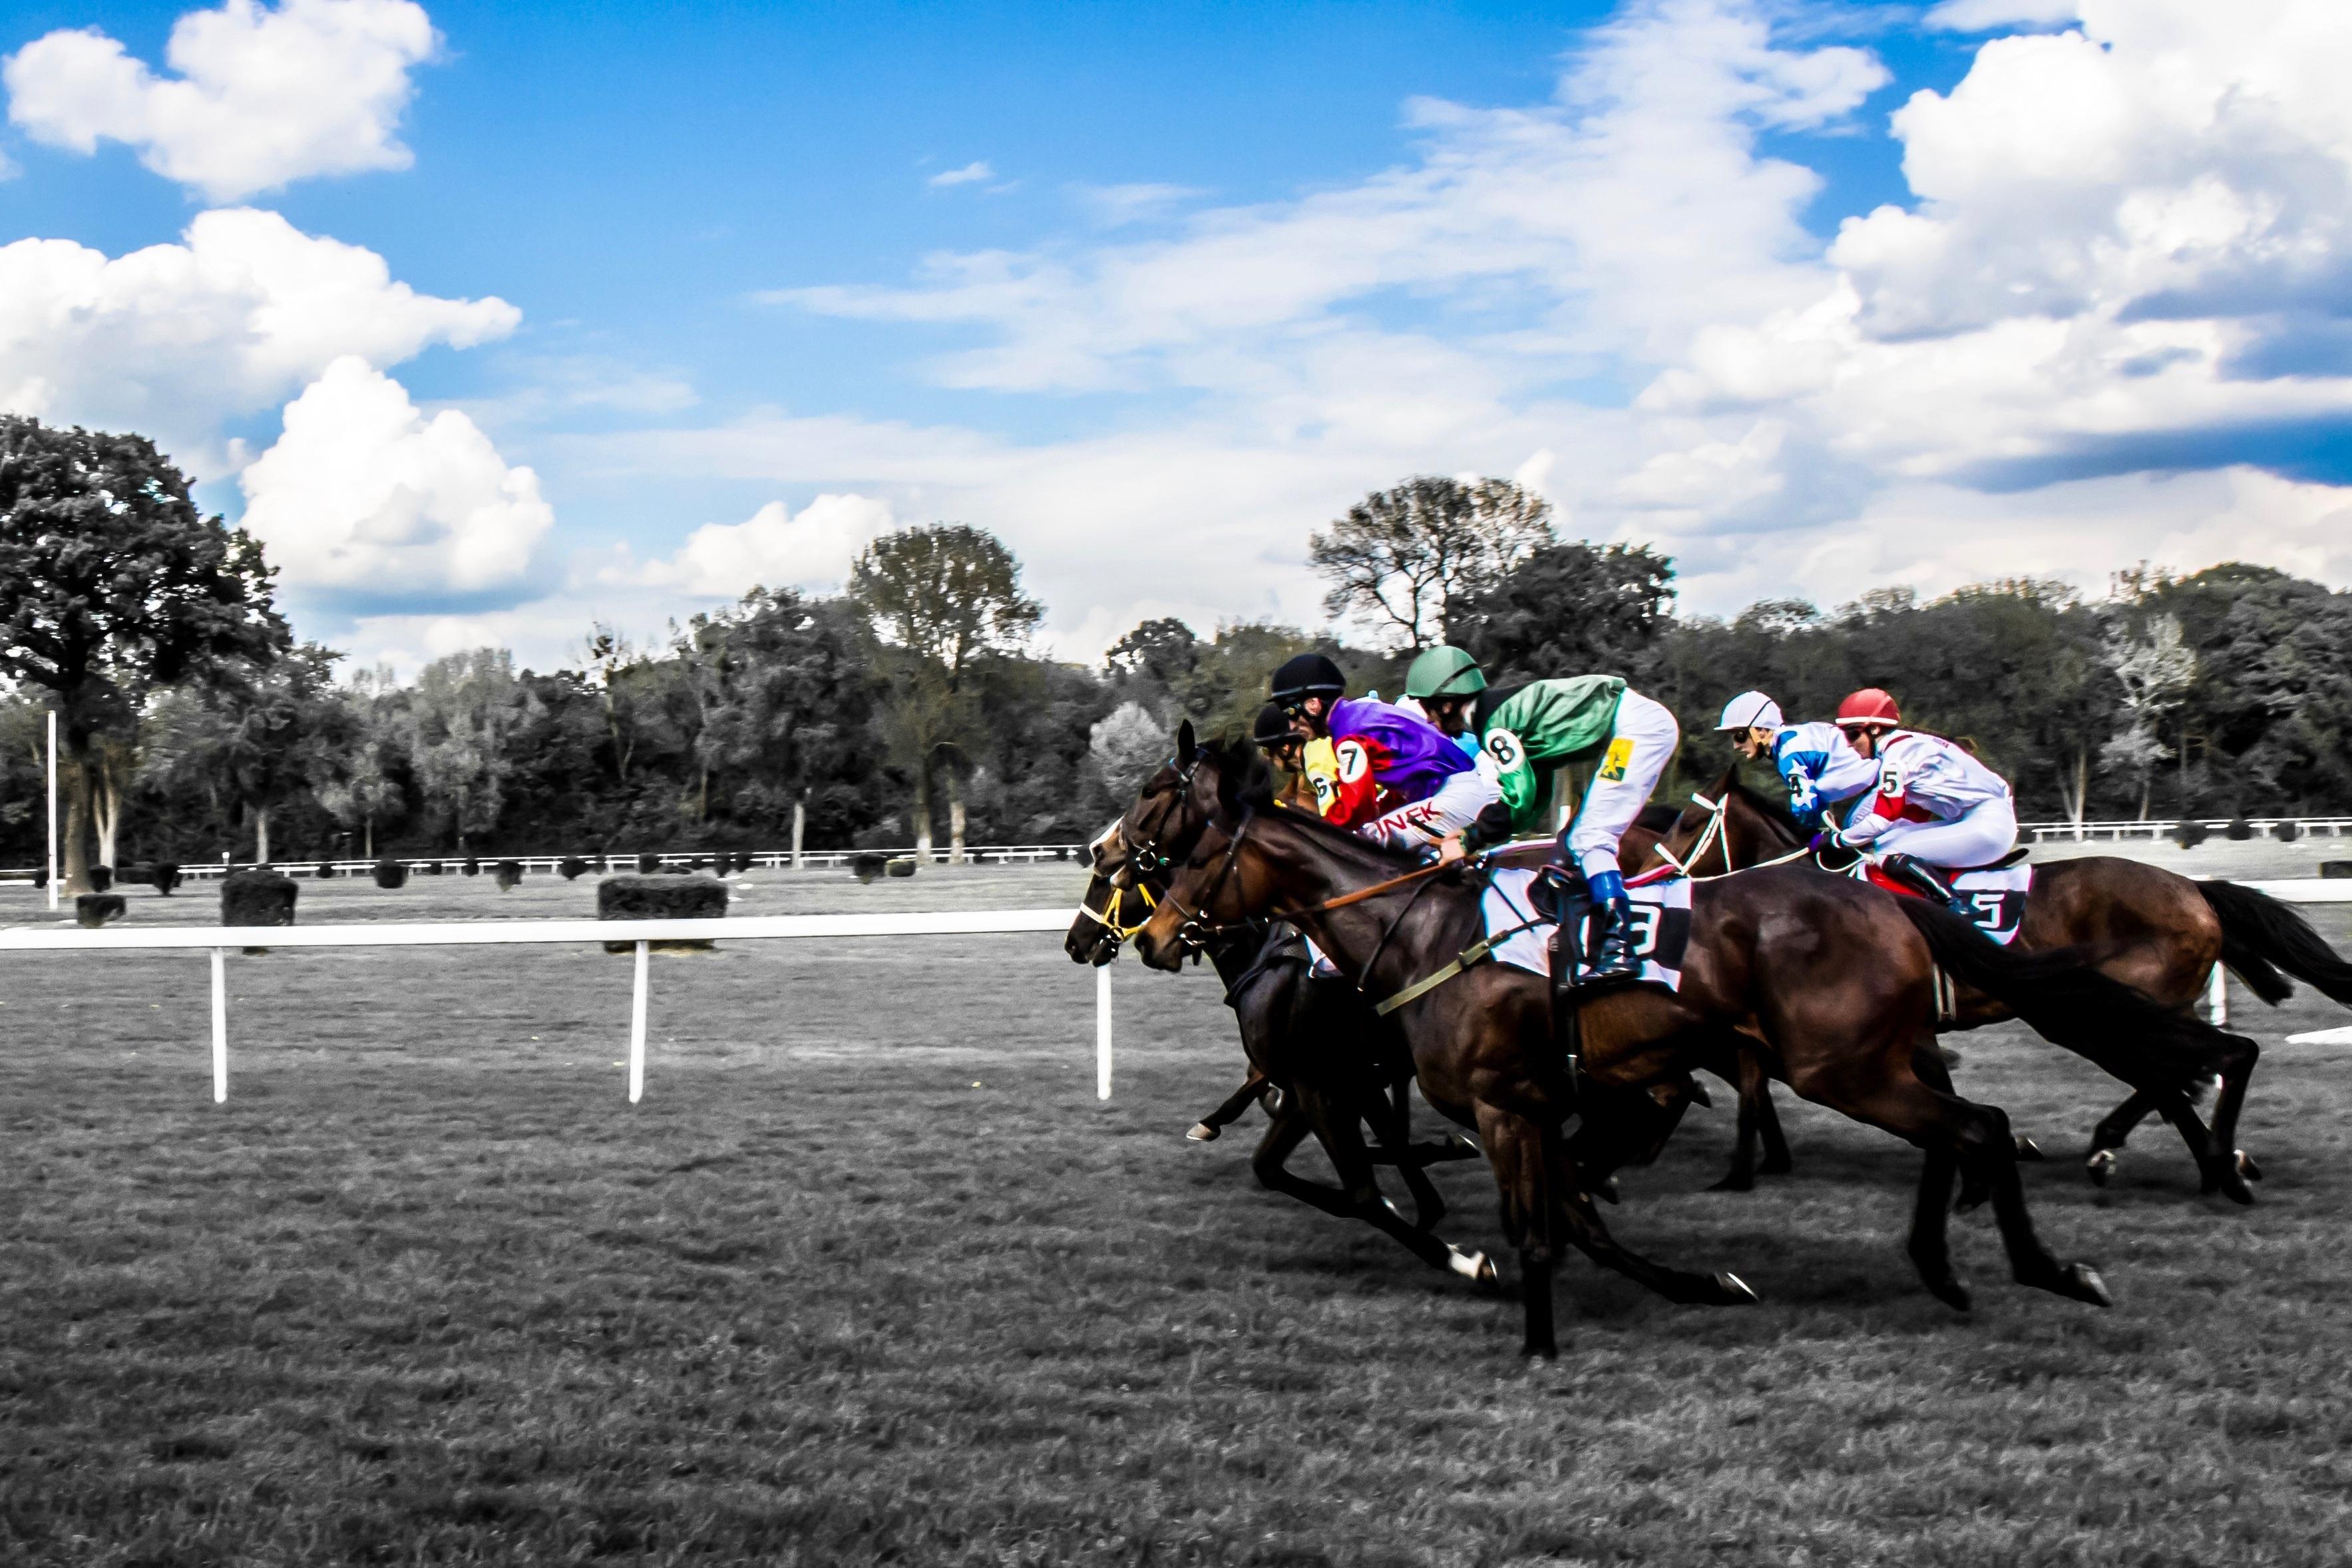 Grass Run Horse Race Competition Horses Sports Racing Jockey Track Gallop Hippodrome